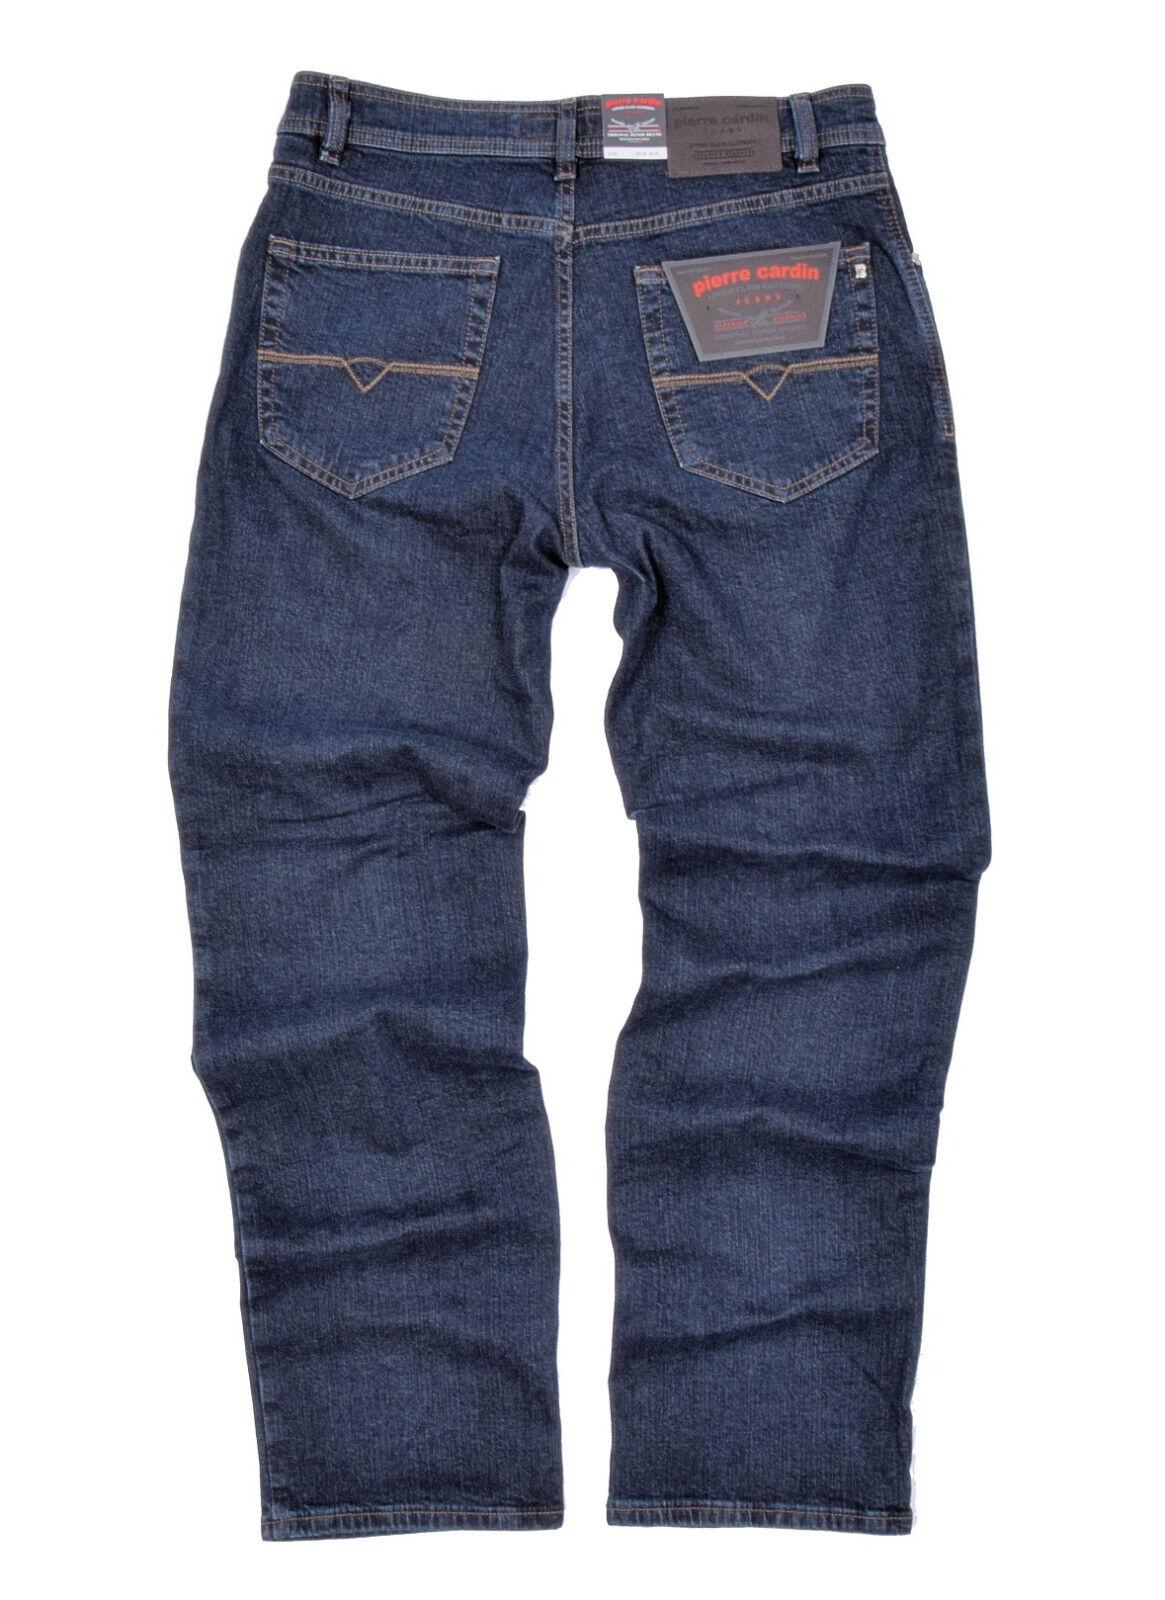 pierre cardin dijon herren regular stretch comfort jeans hoher bund hose ebay. Black Bedroom Furniture Sets. Home Design Ideas